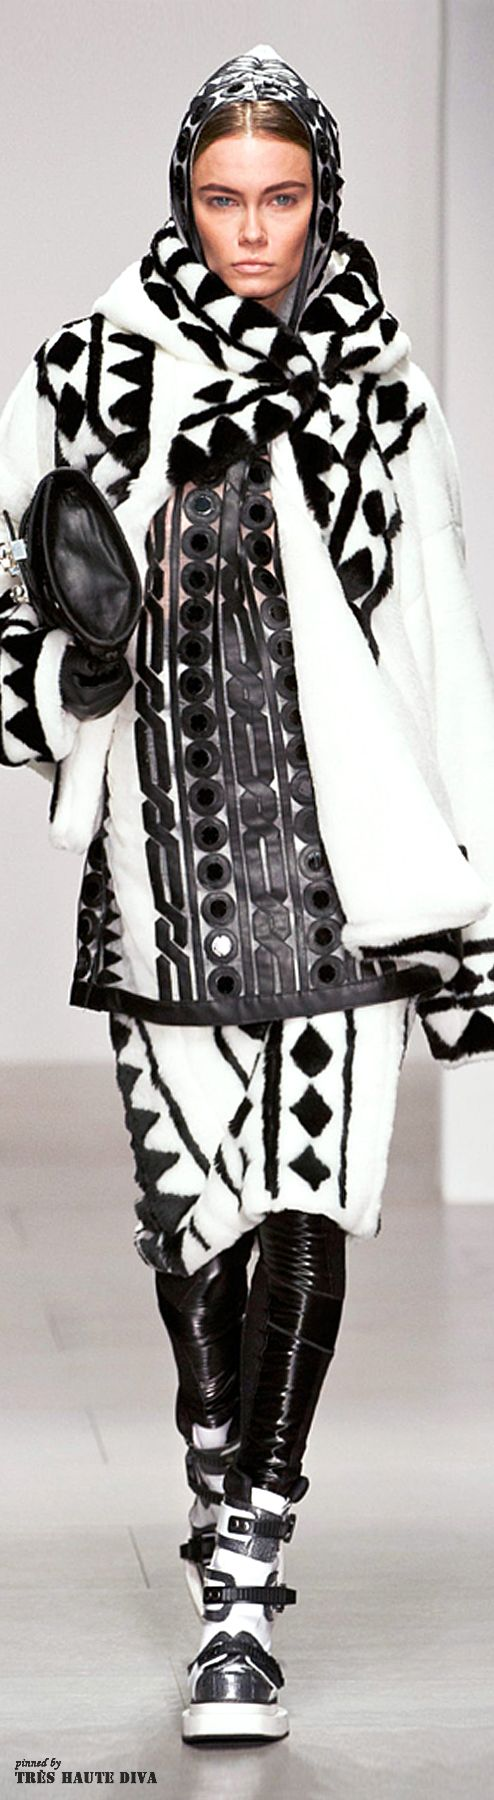 #London Fashion Week KTZ Fall/Winter 2014 RTW